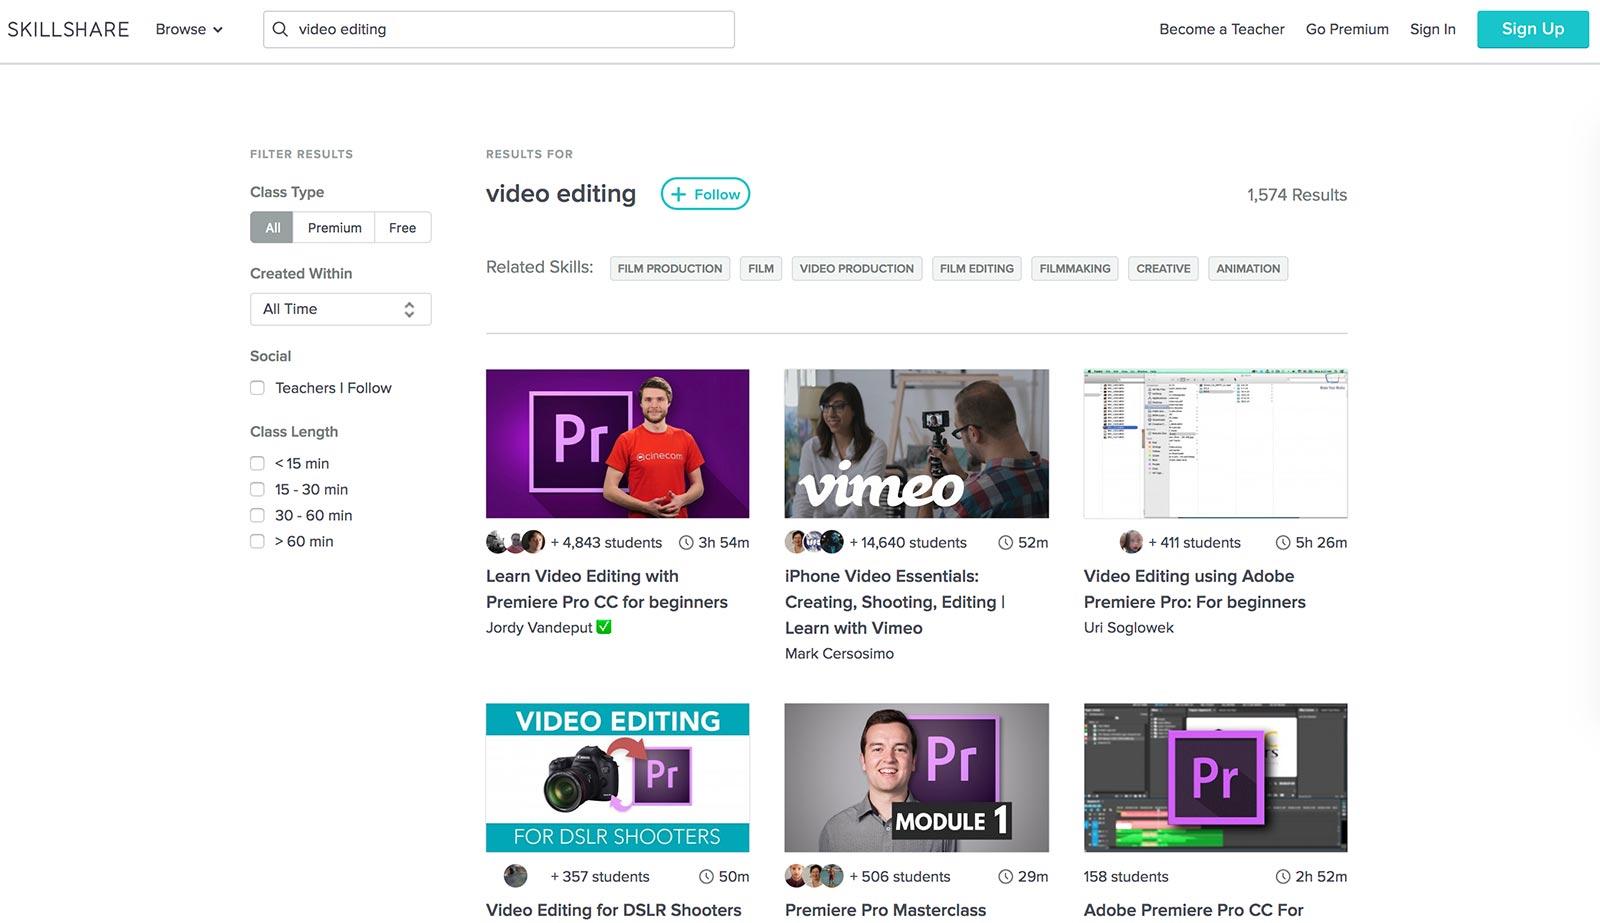 skillshare video editing classes